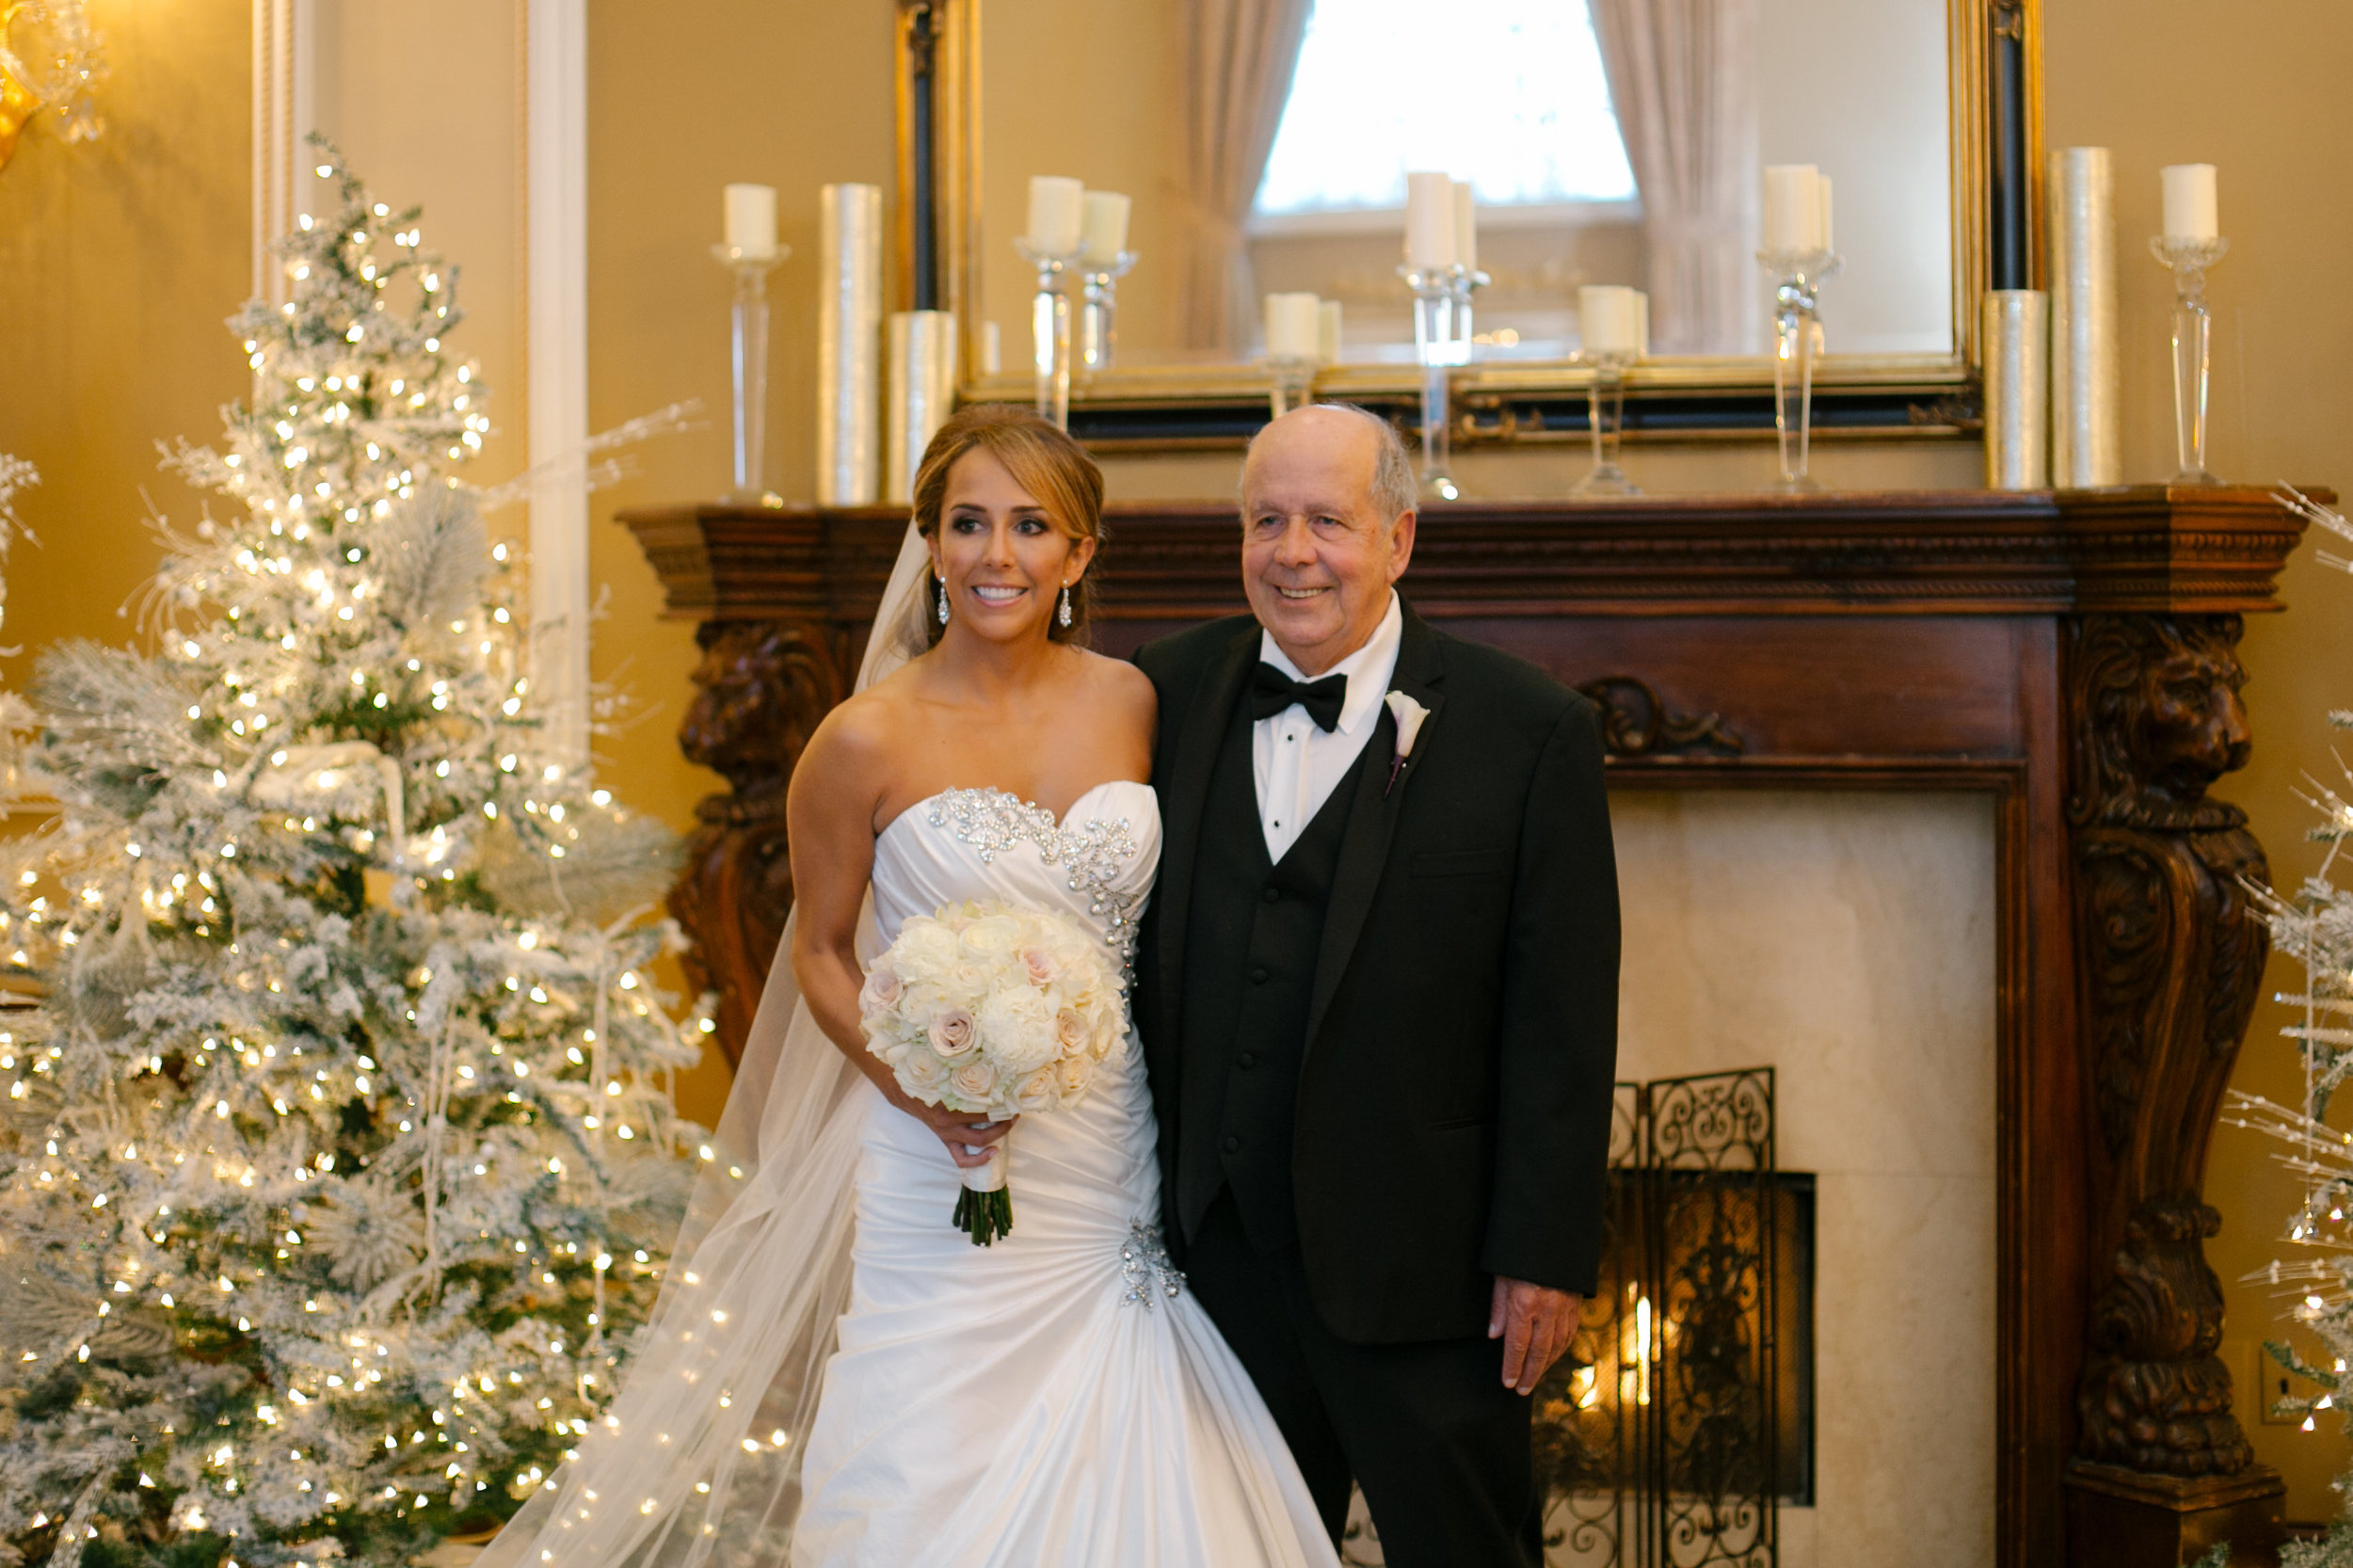 Ceci_New_York_Custom_Invitation_ New_Jersey_Wedding_Luxury_Personalized_Ceci_Style_Bride_Foil_Stamping33.jpg